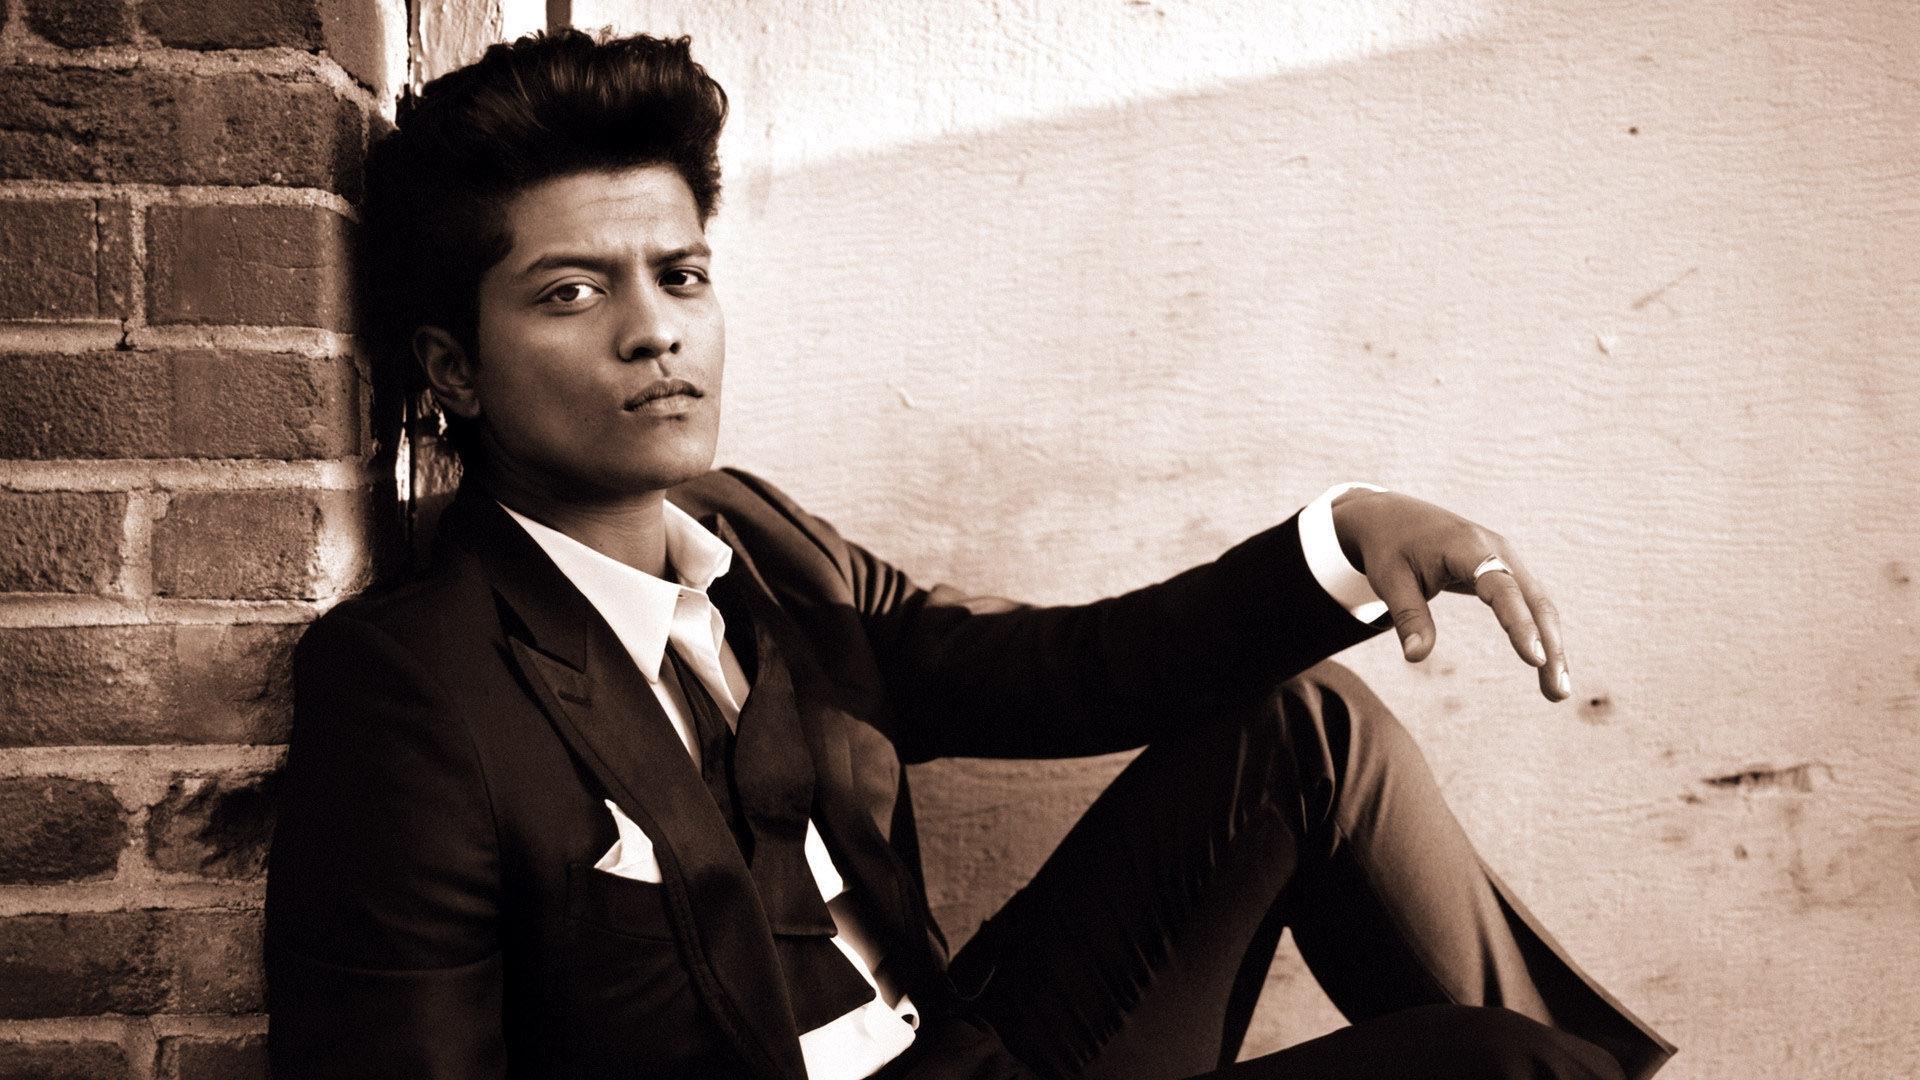 Bruno Mars Wallpaper For Windows